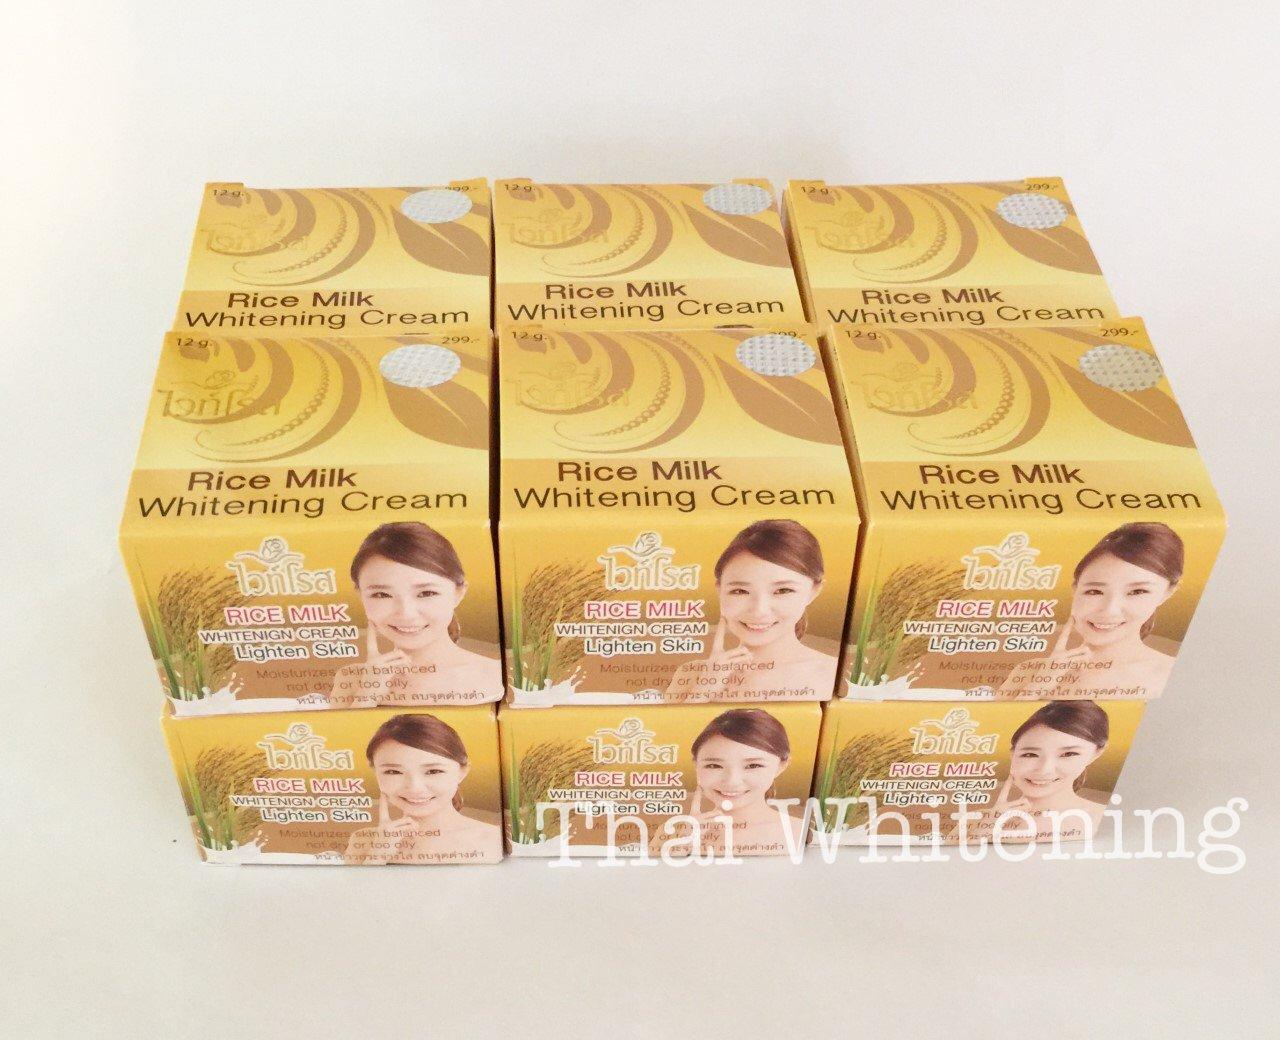 12 x Thai WHITE ROSE Rice Milk Melasma Dark spots Blemishes Skin Whitening Cream 12g.